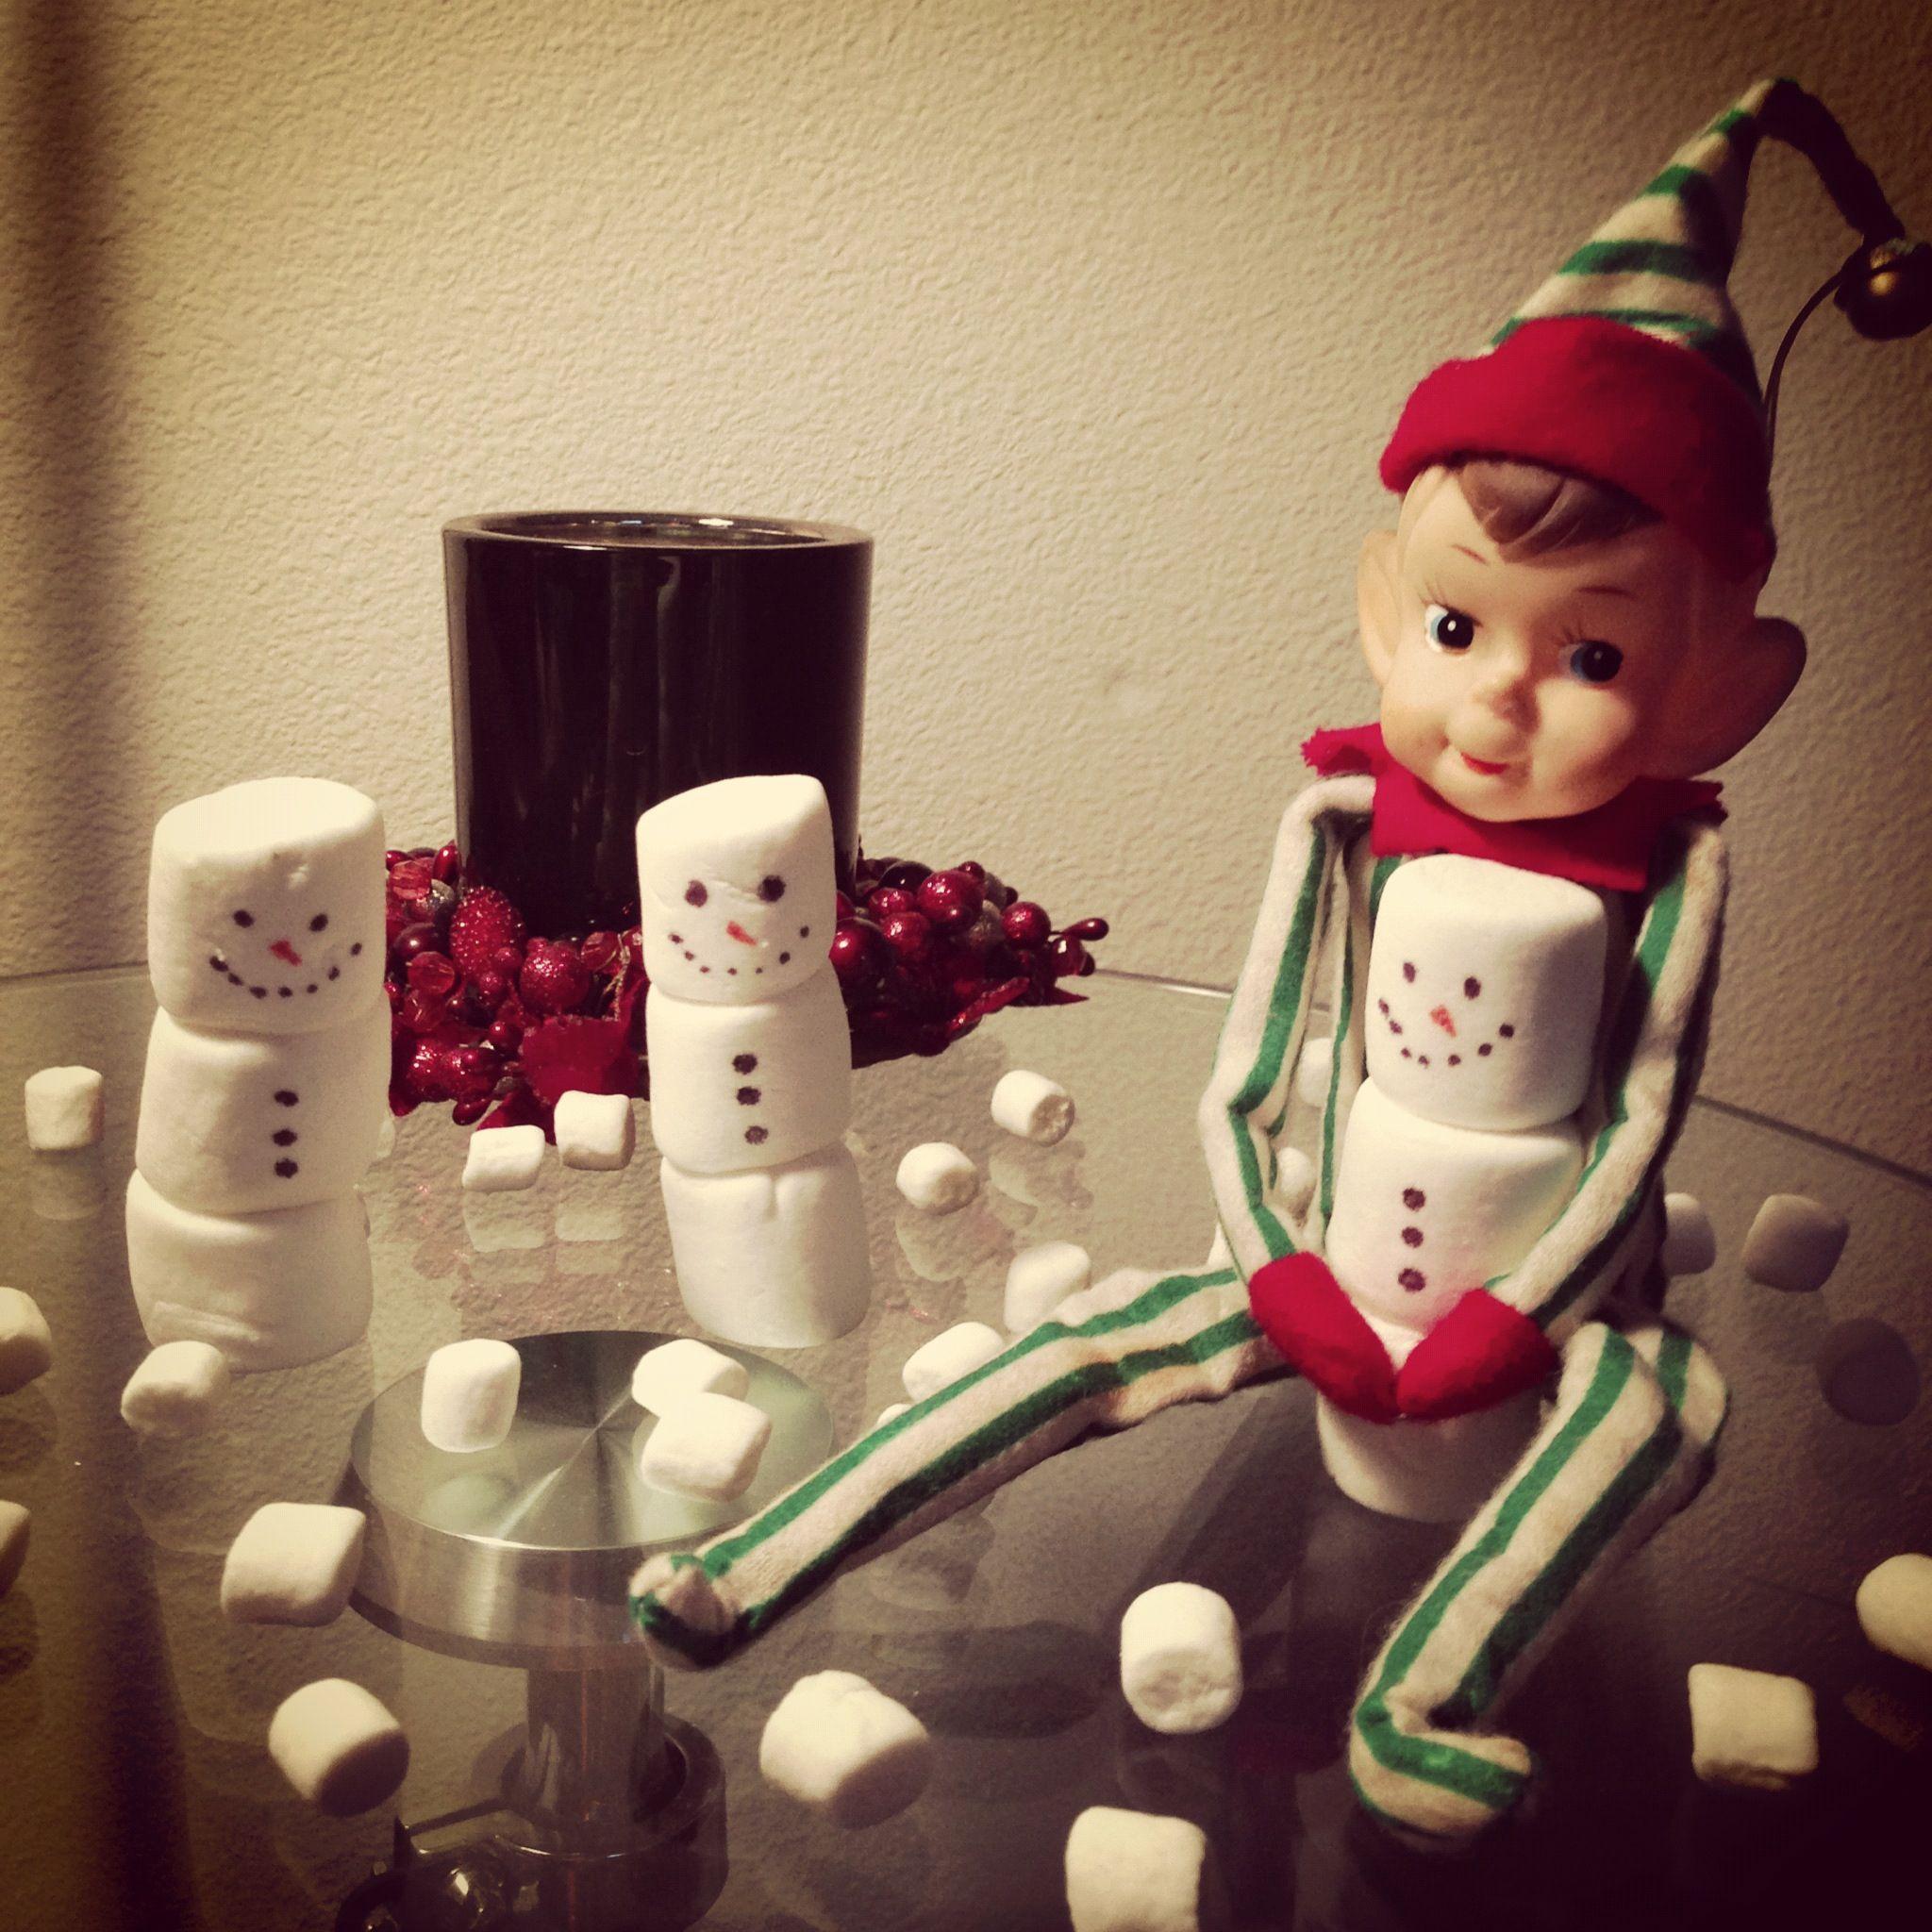 Sammy, our elf, built some snowmen. Elf on a Shelf